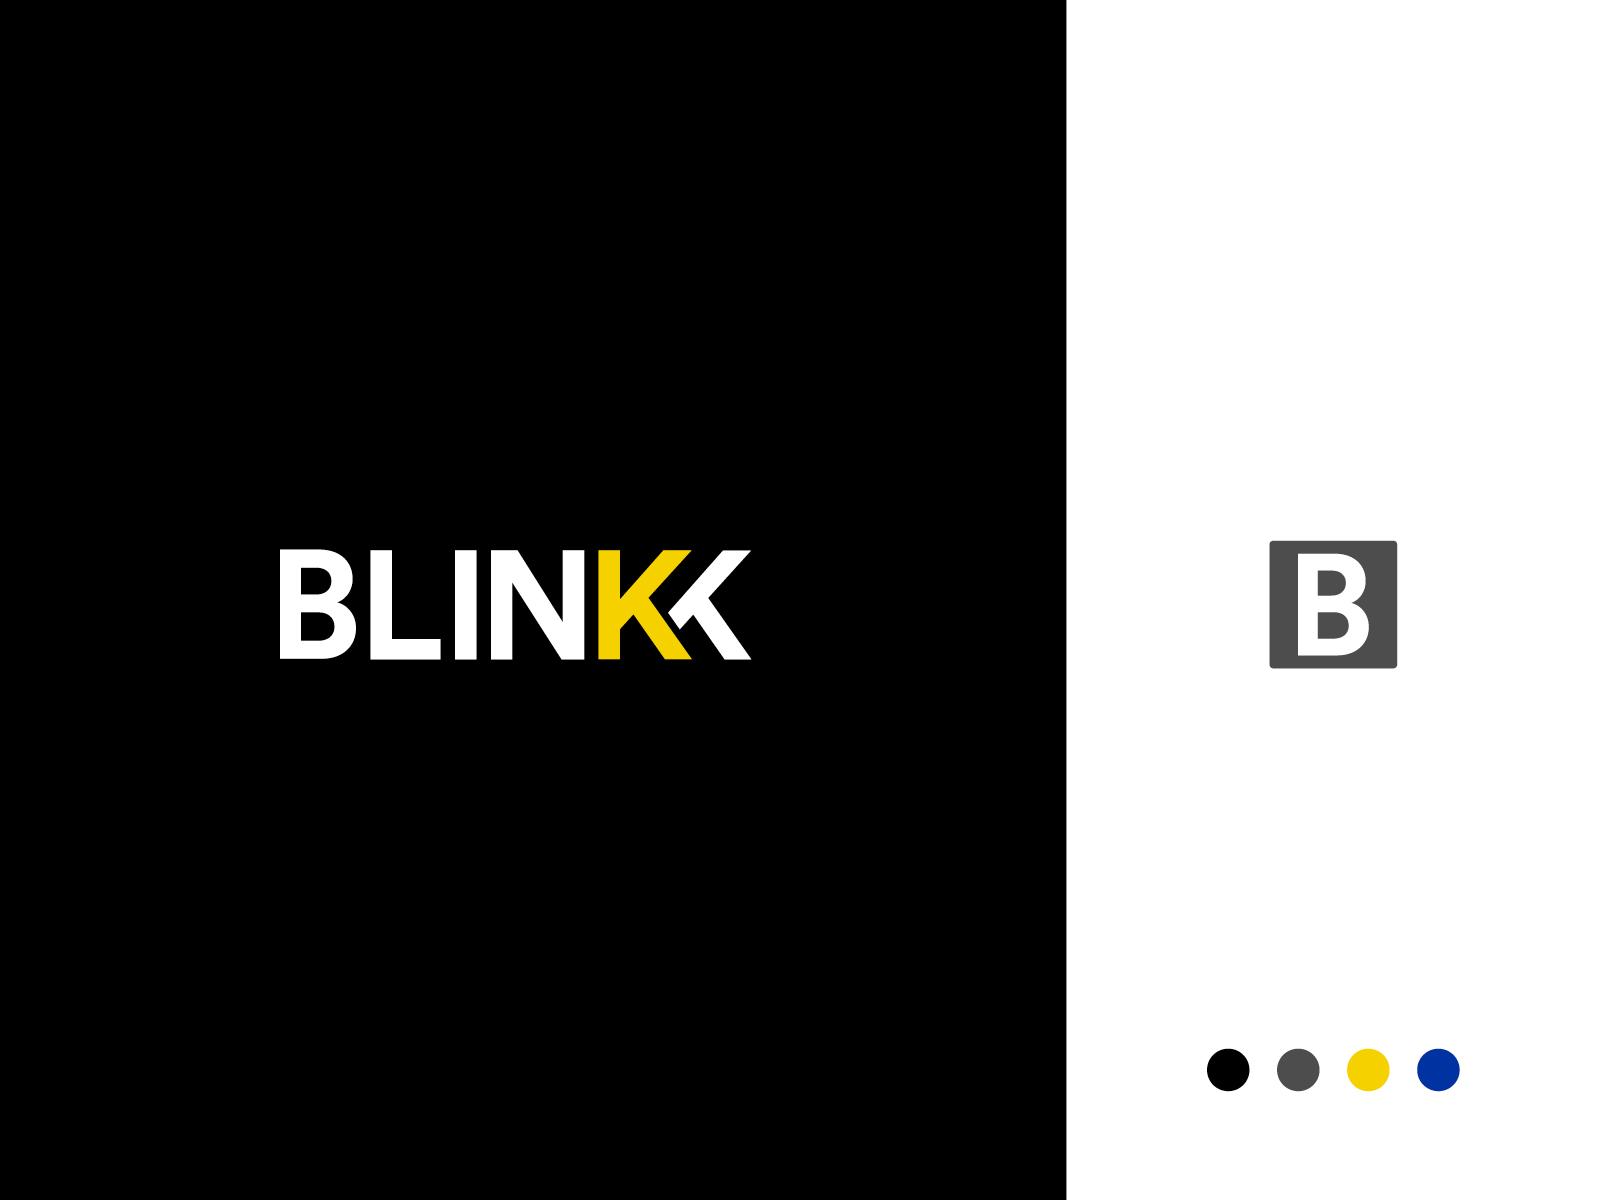 Io dribble blinkk